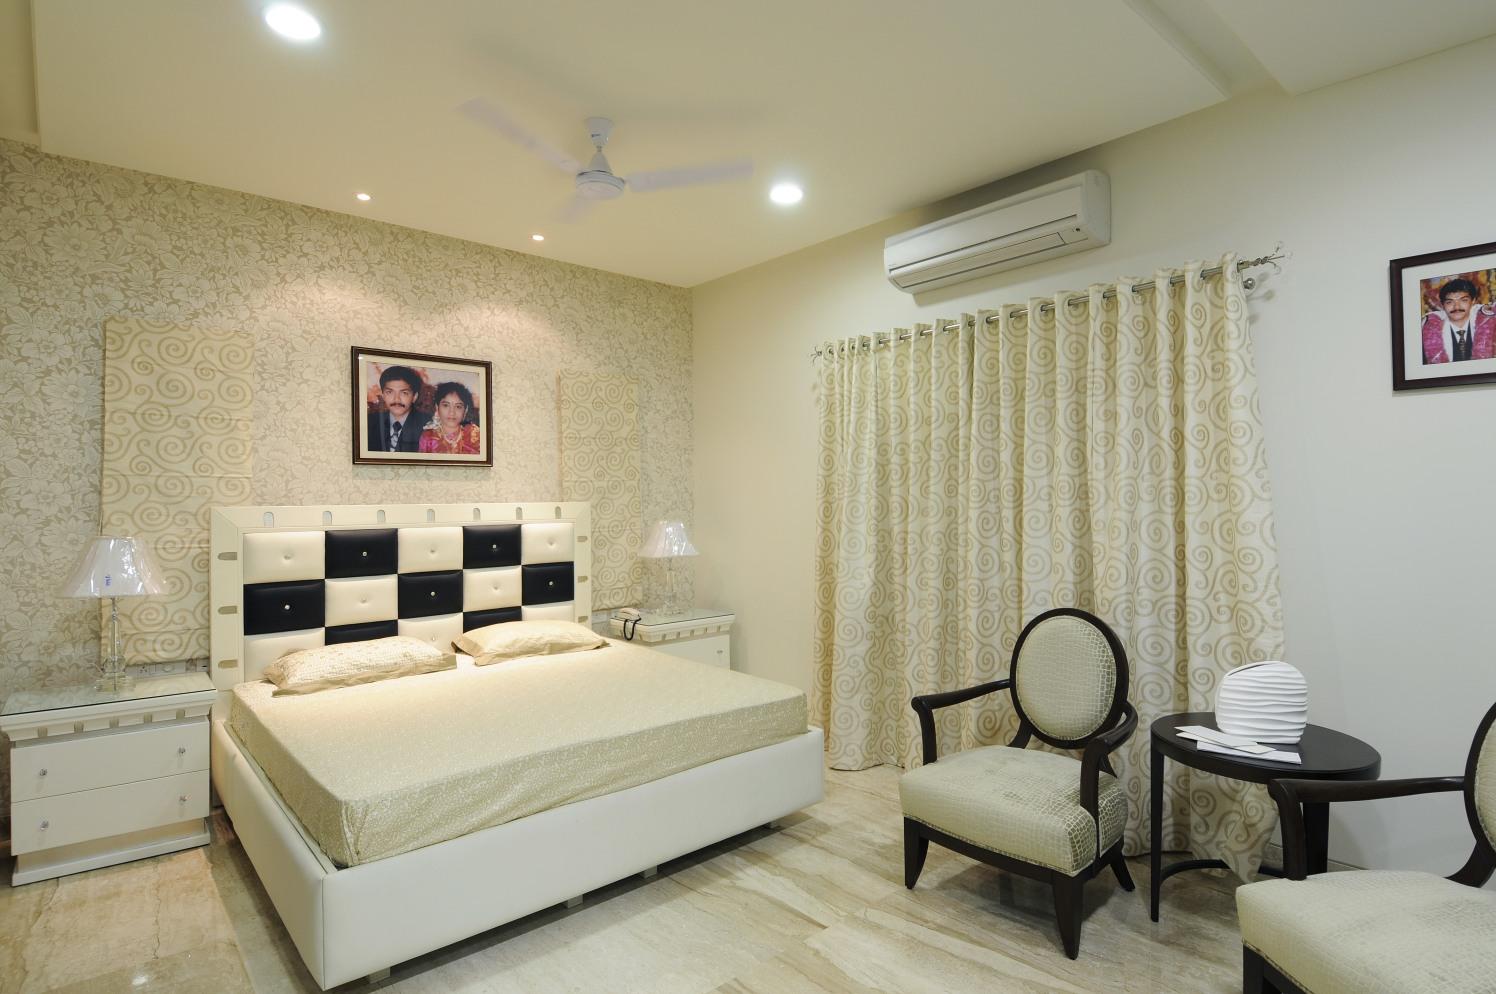 Bedroom With Amazing Wall Art by Nandigam Harish Bedroom Modern | Interior Design Photos & Ideas